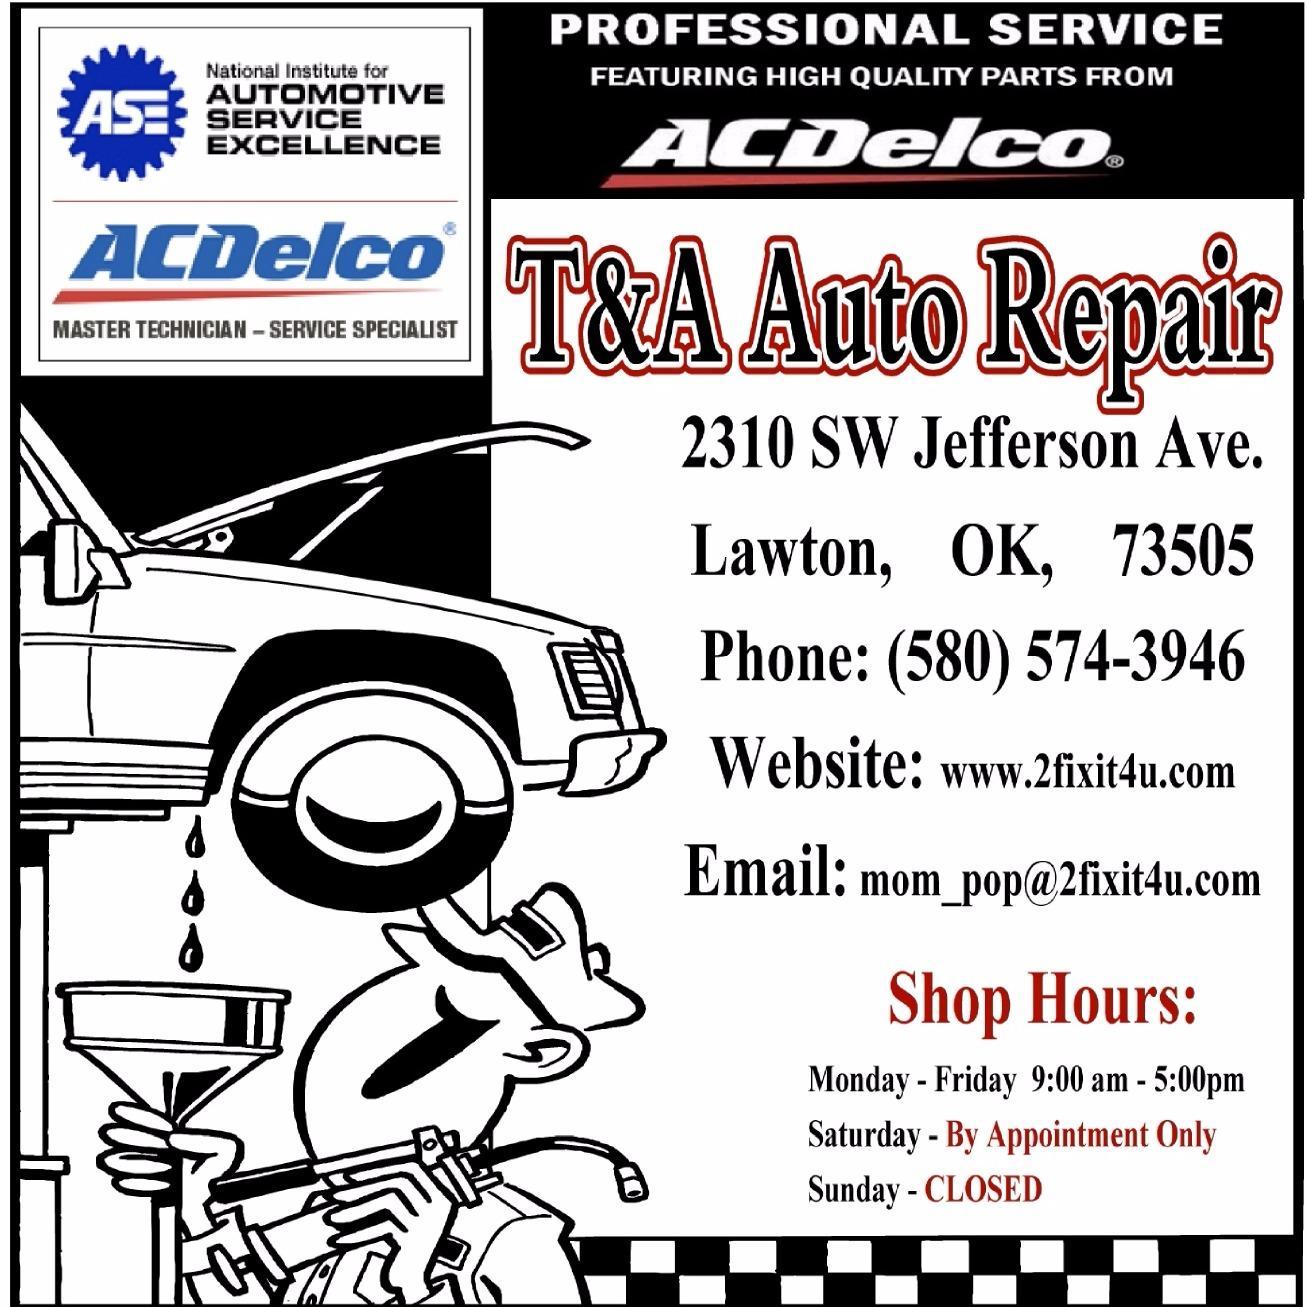 T&A Auto Repair